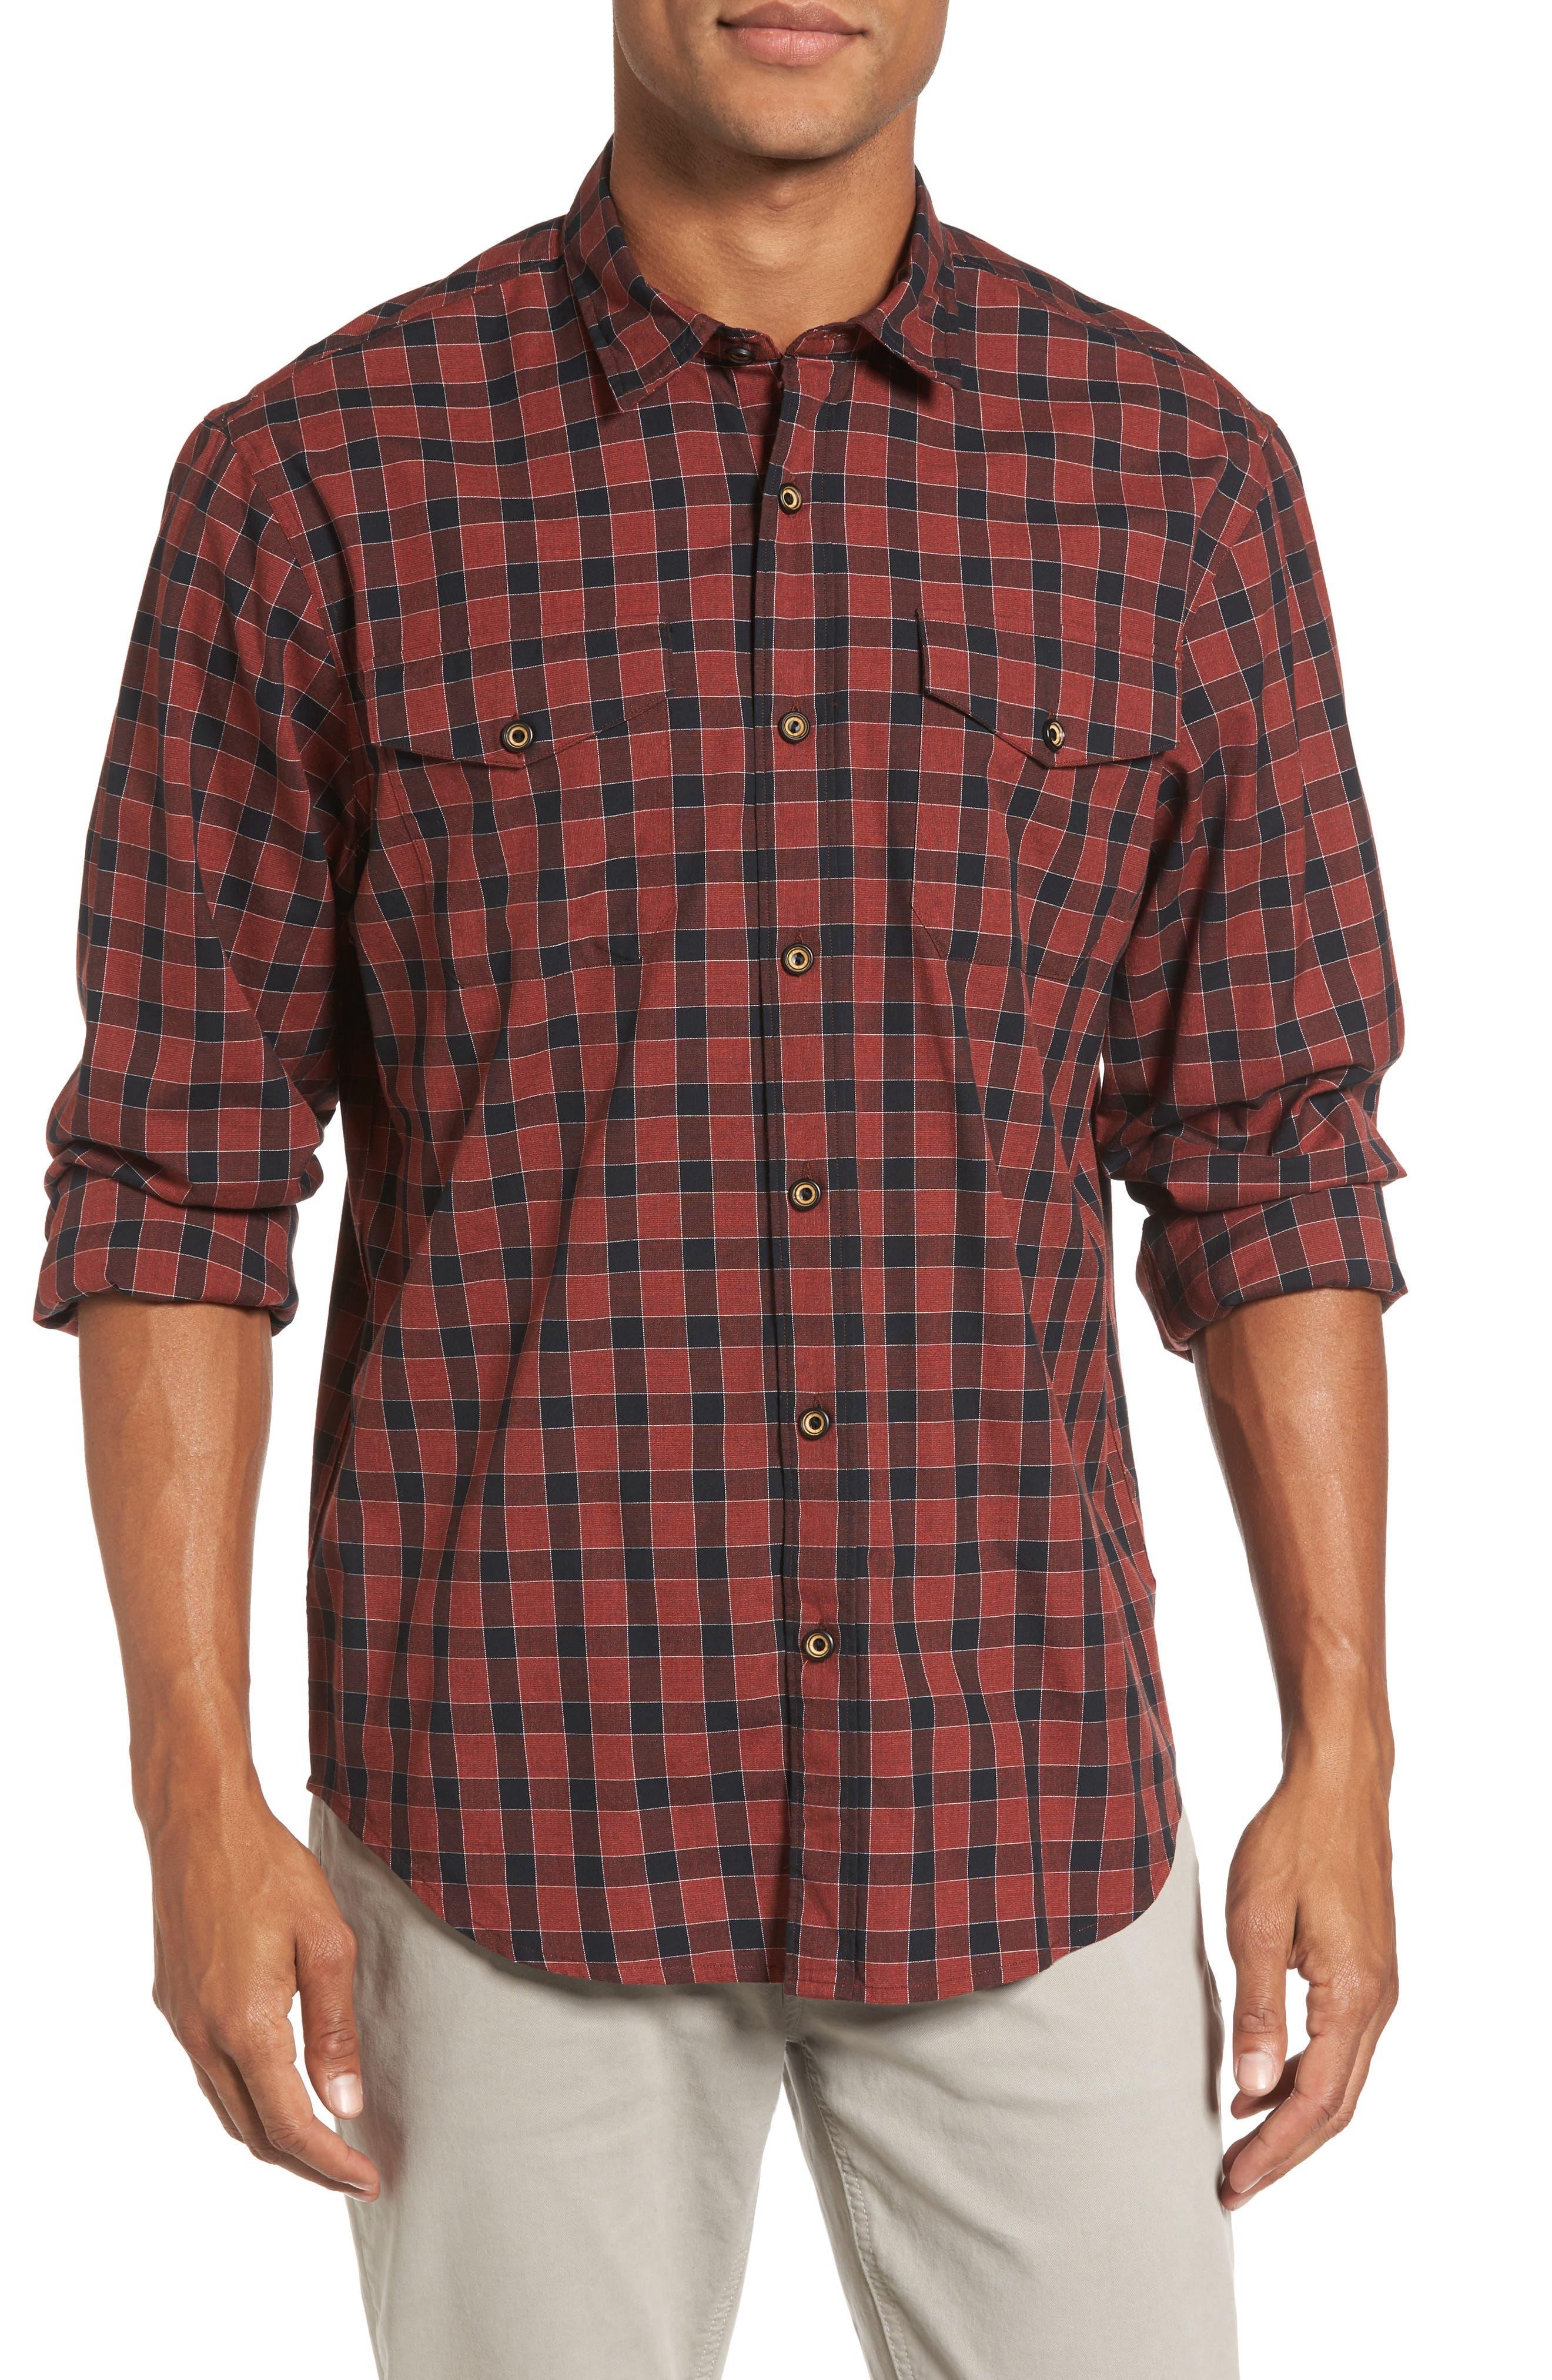 Lake Plaid Flannel Shirt,                             Main thumbnail 1, color,                             600